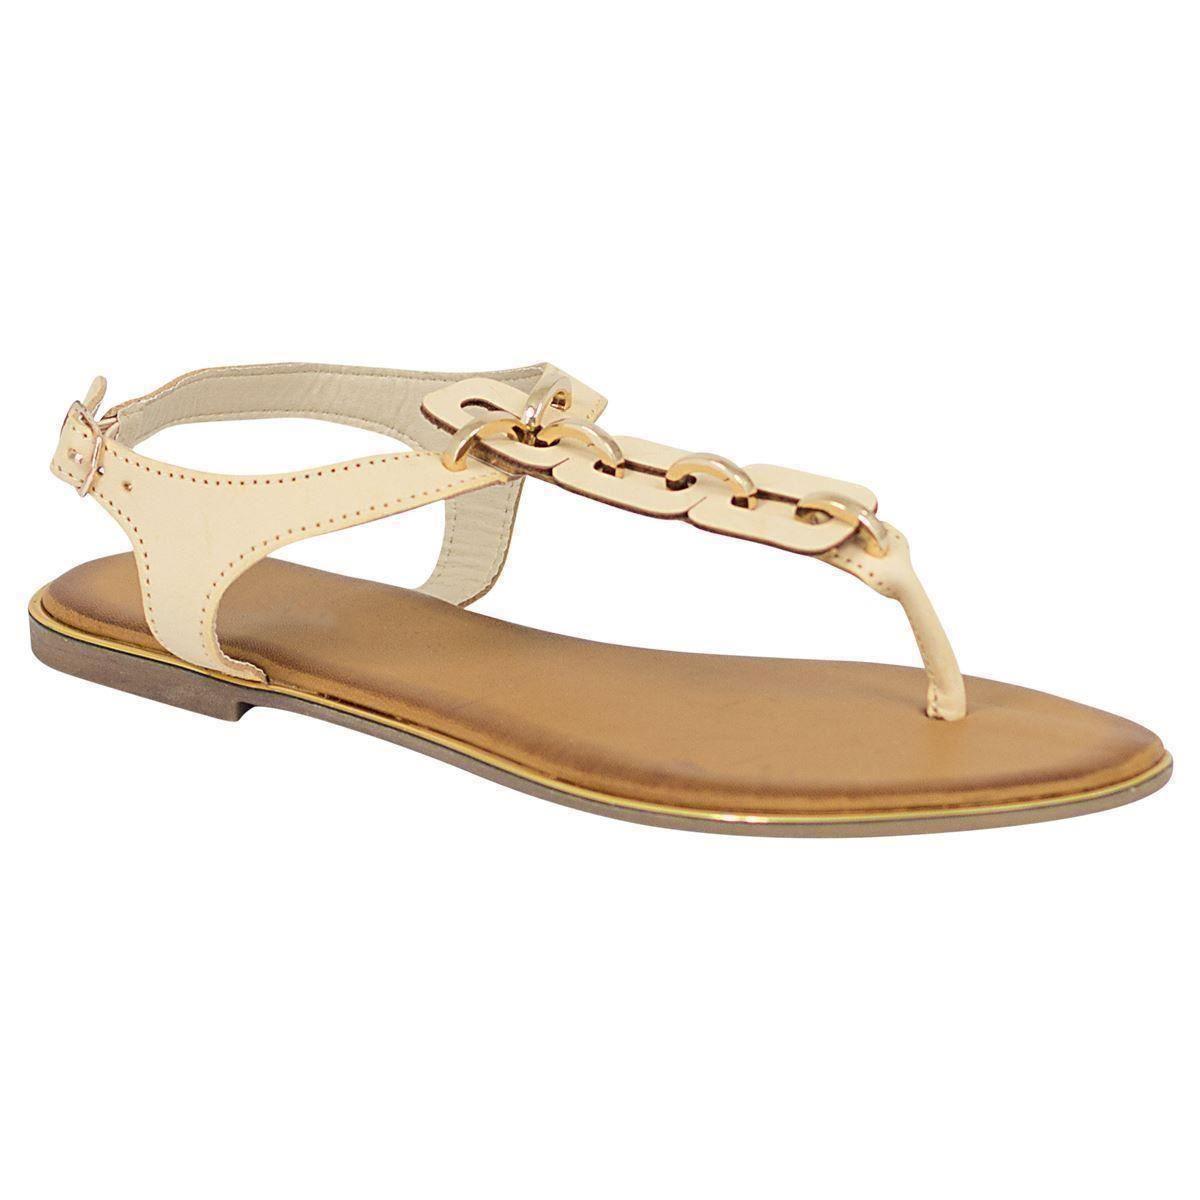 Womens Ladies T Bar Toe Sandals Shoes Flat Heel Gold Chain ...